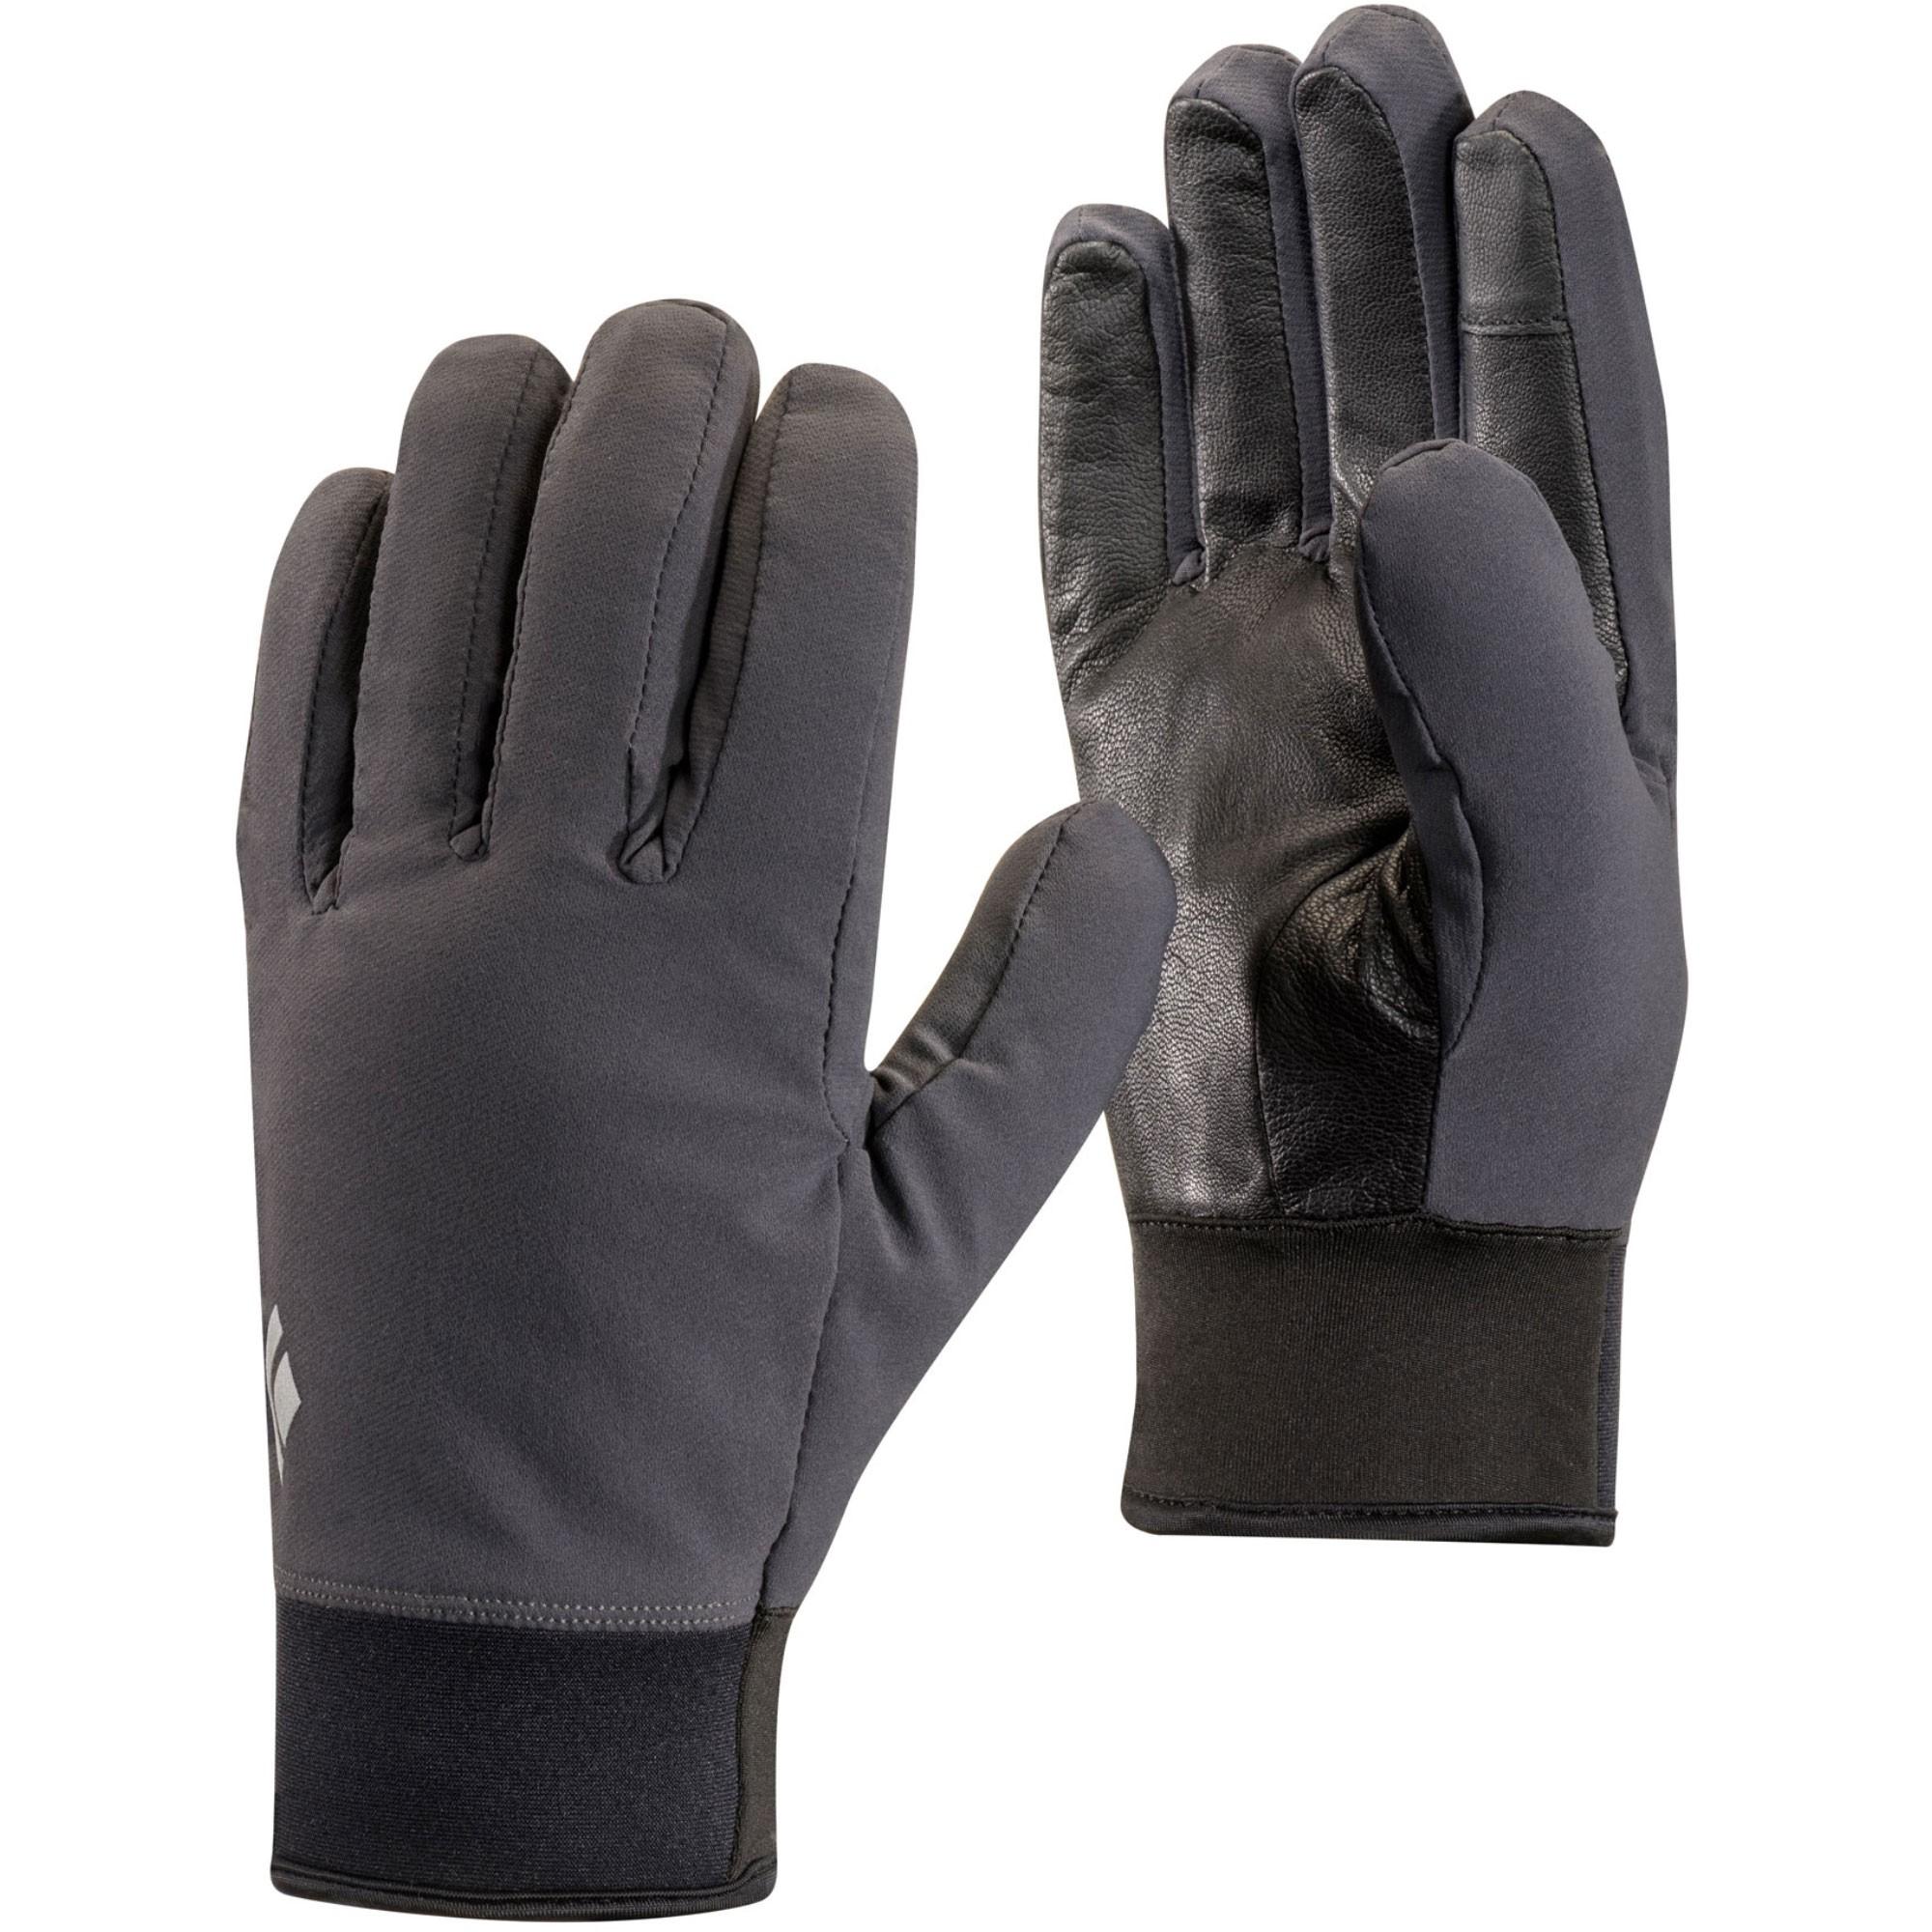 Black-Diamond-MidWeight-Softshell-Gloves-Smoke-W17